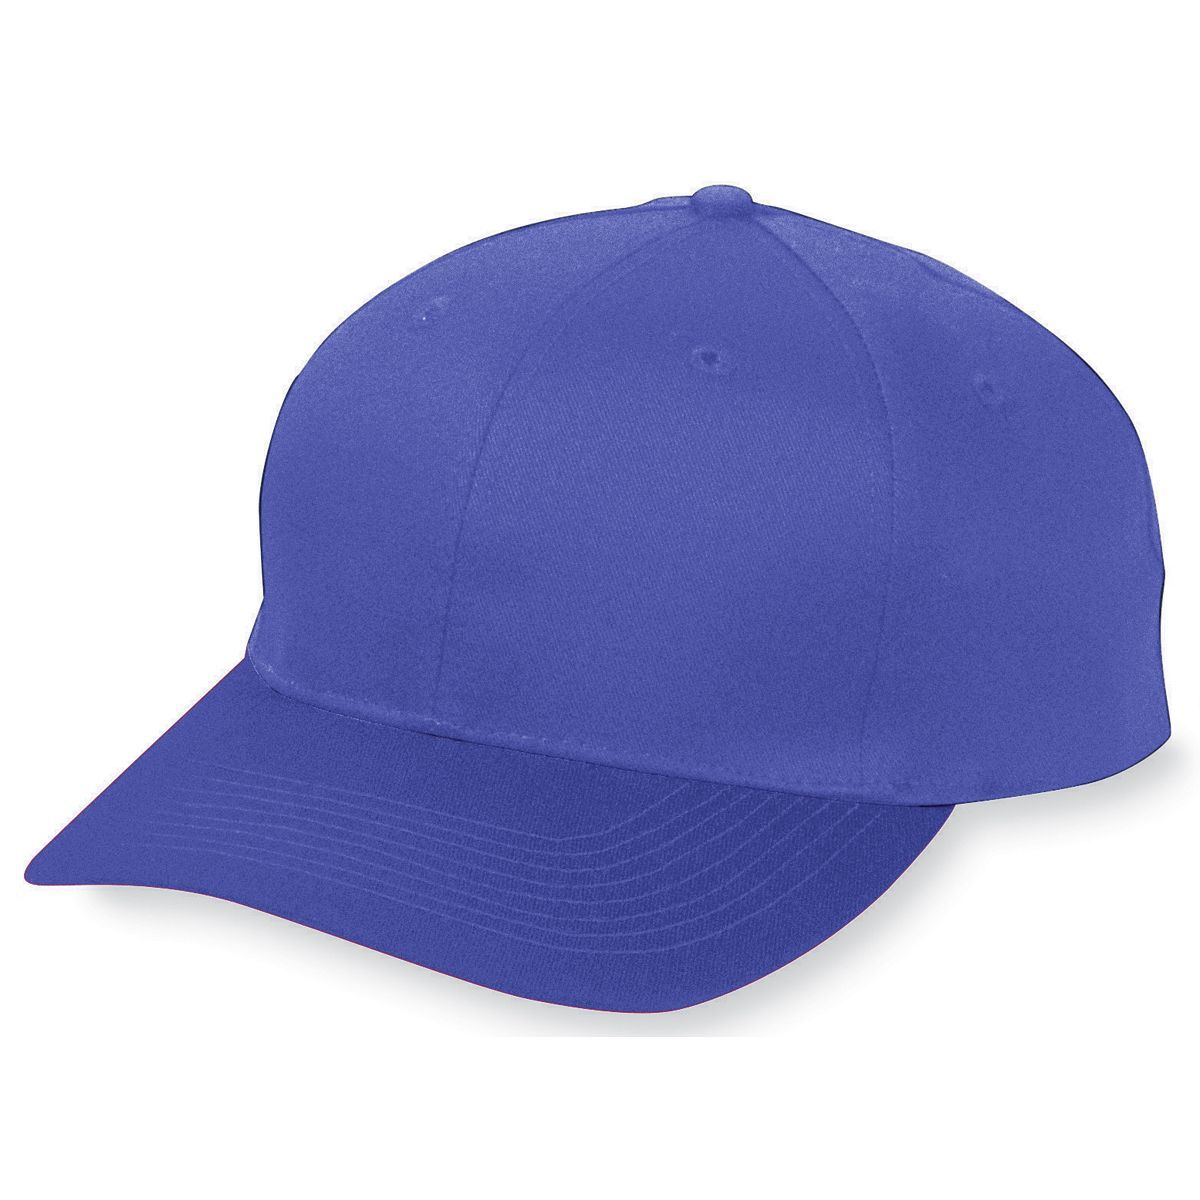 Six-Panel Cotton Twill Low-Profile Cap - PURPLE